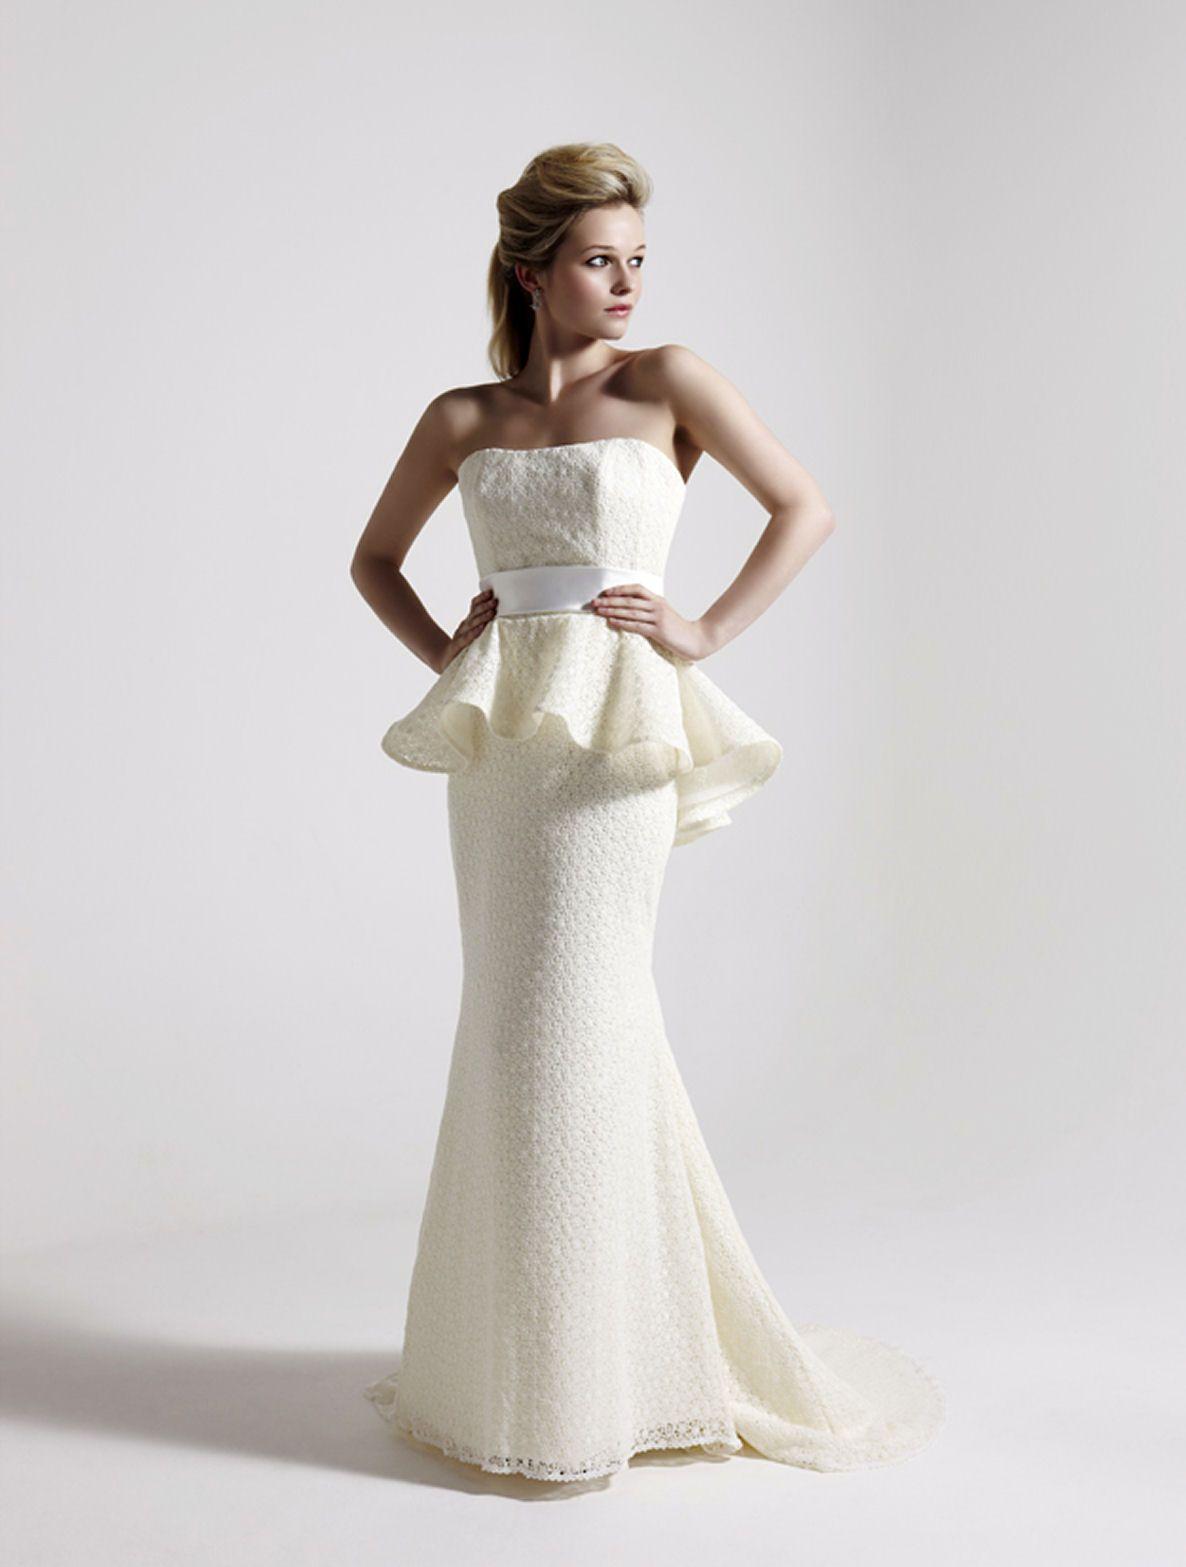 Peplum wedding dress google search my lifemeday peplum wedding dress google search junglespirit Gallery